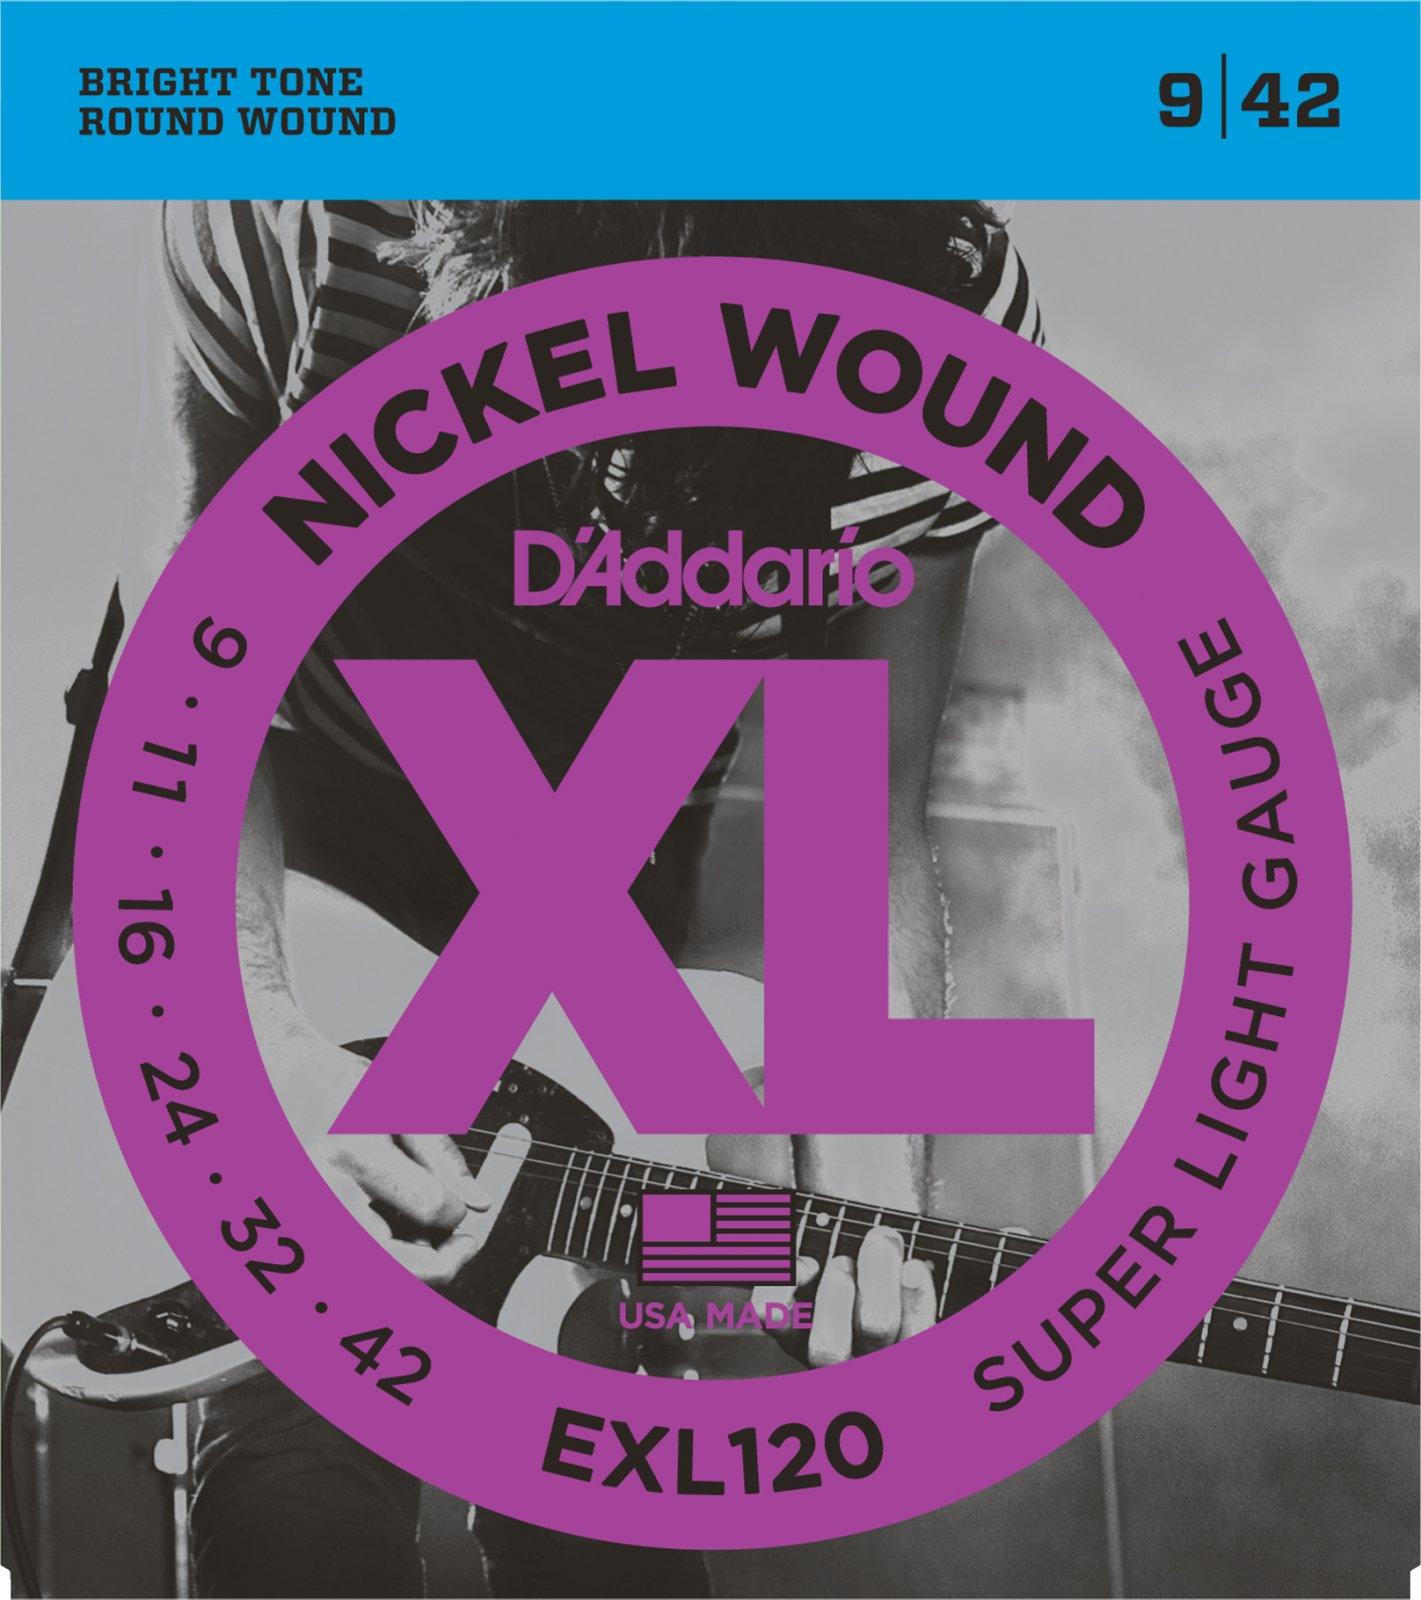 D'Addario XL Nickel Wound EXL120 Electric Guitar Strings, Super Light, 9-42